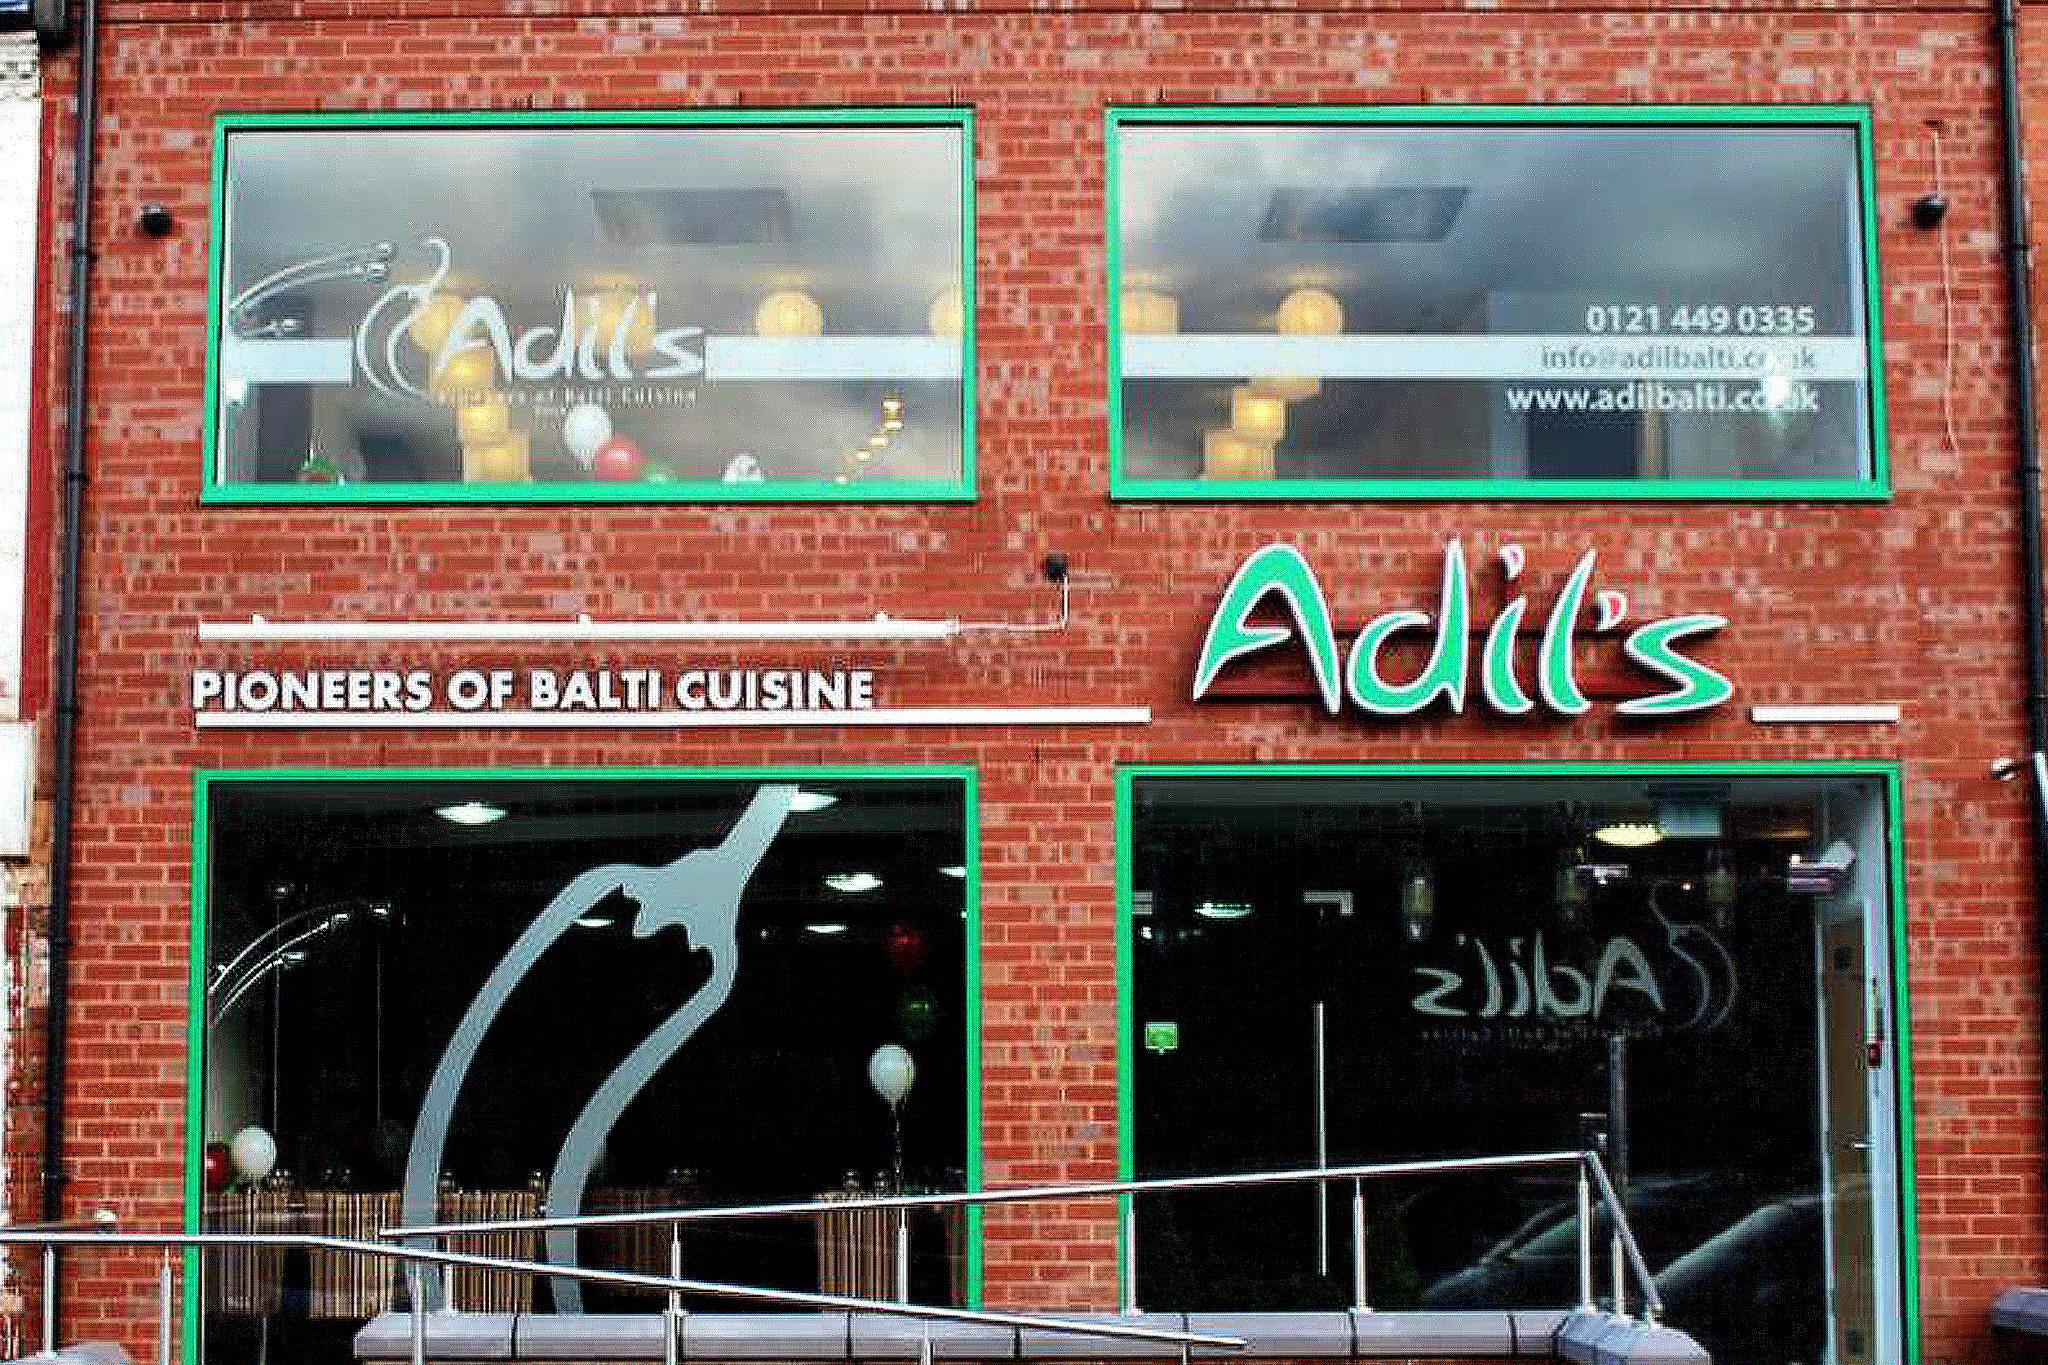 Adil's Balti